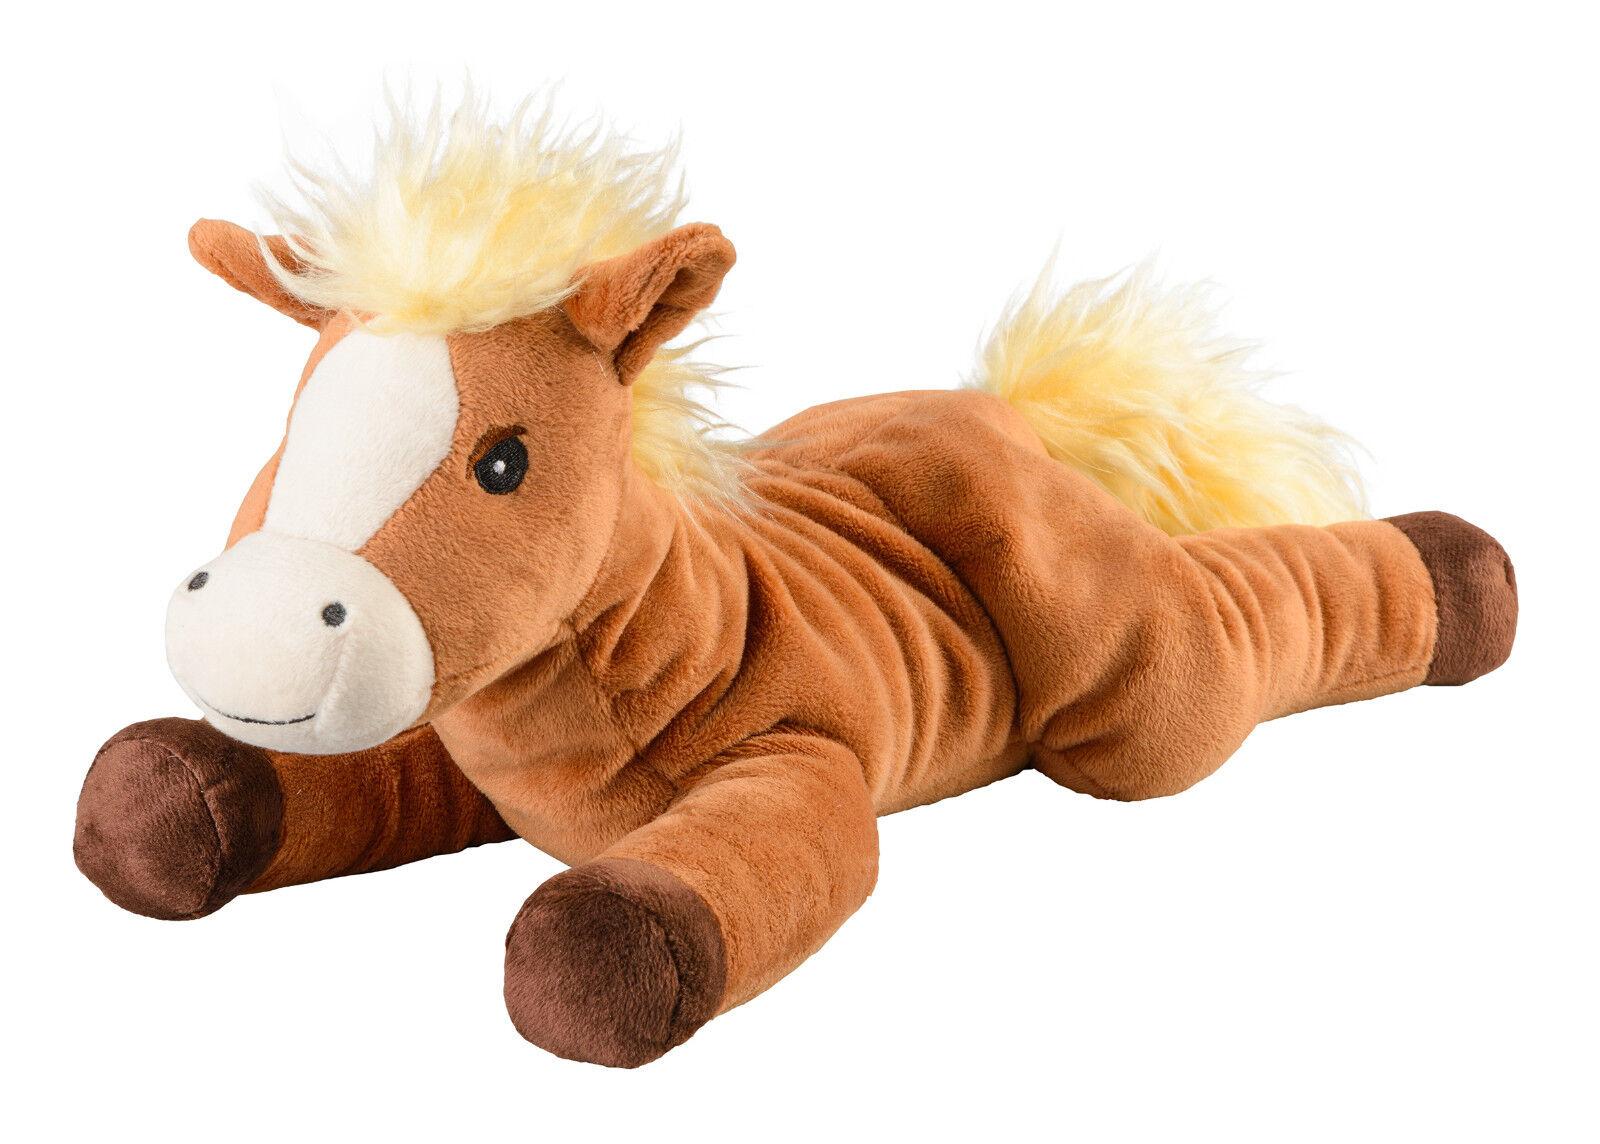 Original Warmies Greenlife Wärmestofftier Wärmekissen Körnerkissen Wärmetier NEU Pony